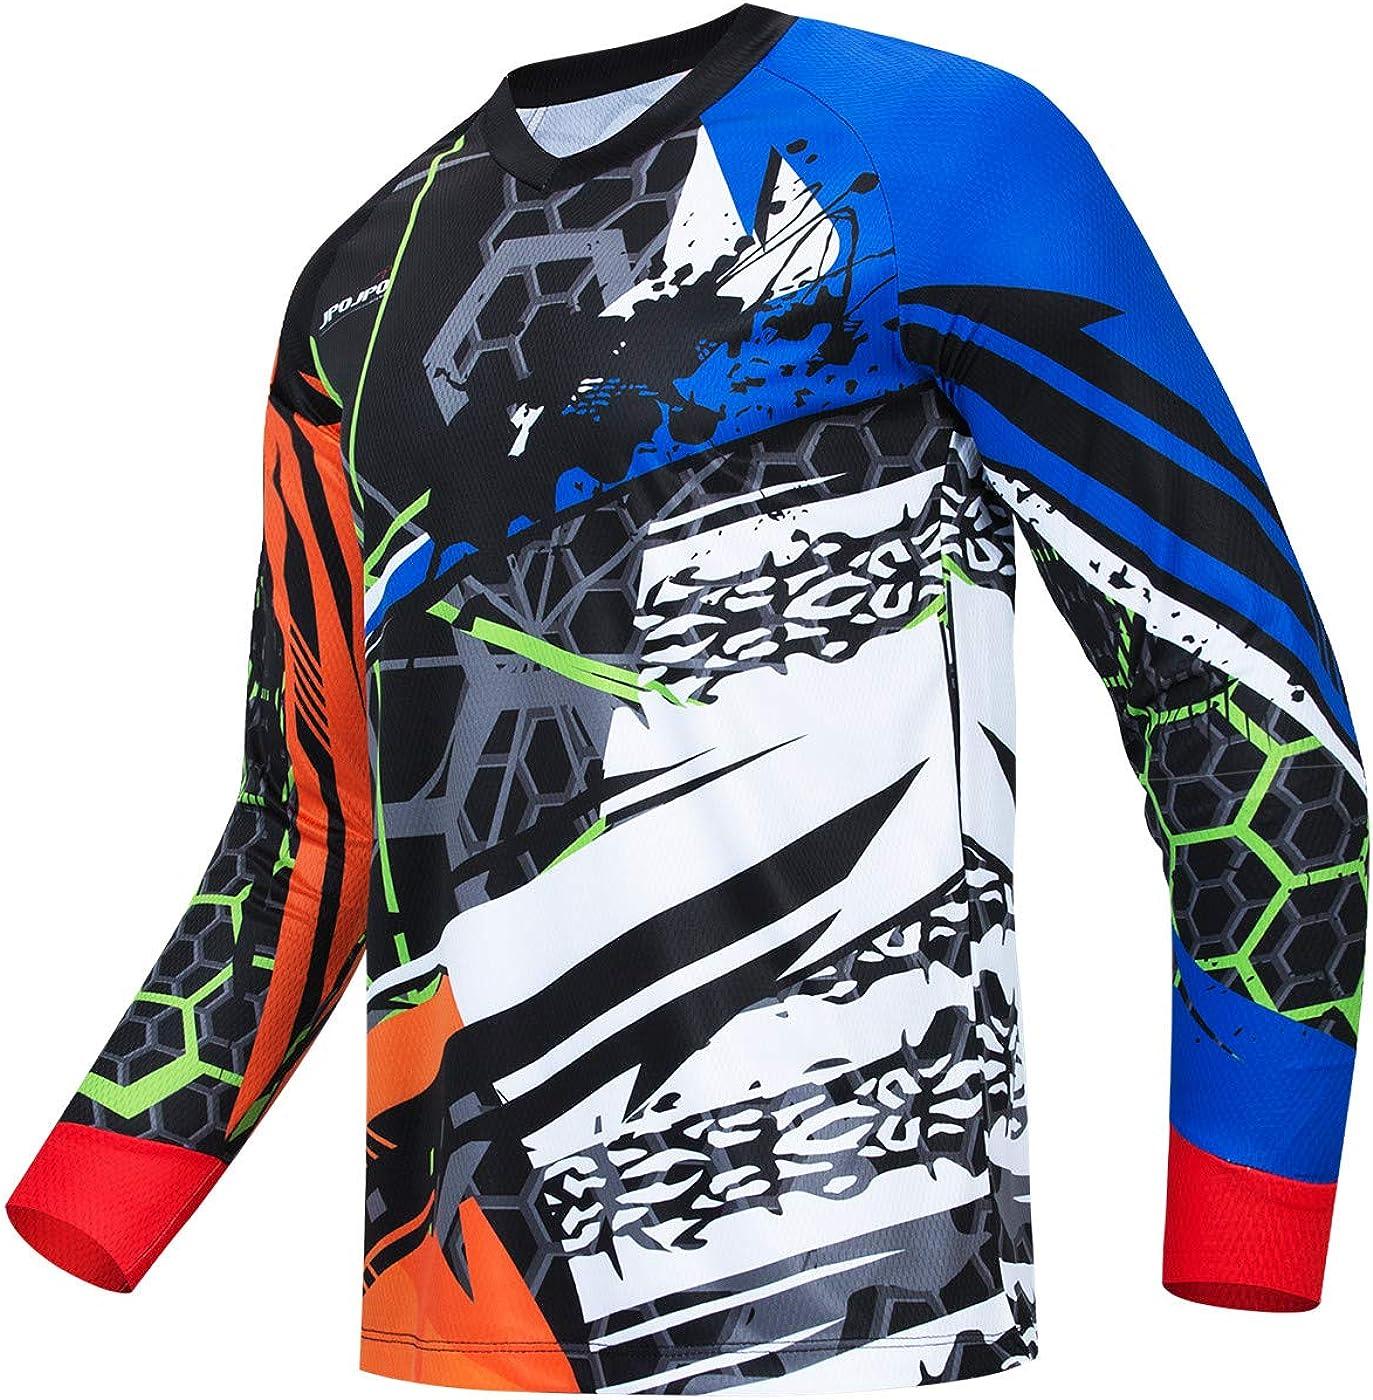 Hotlion Cycling Jersey Men Long Shirt Sleeve MTB 5 ☆ San Jose Mall very popular Off-R Motocross